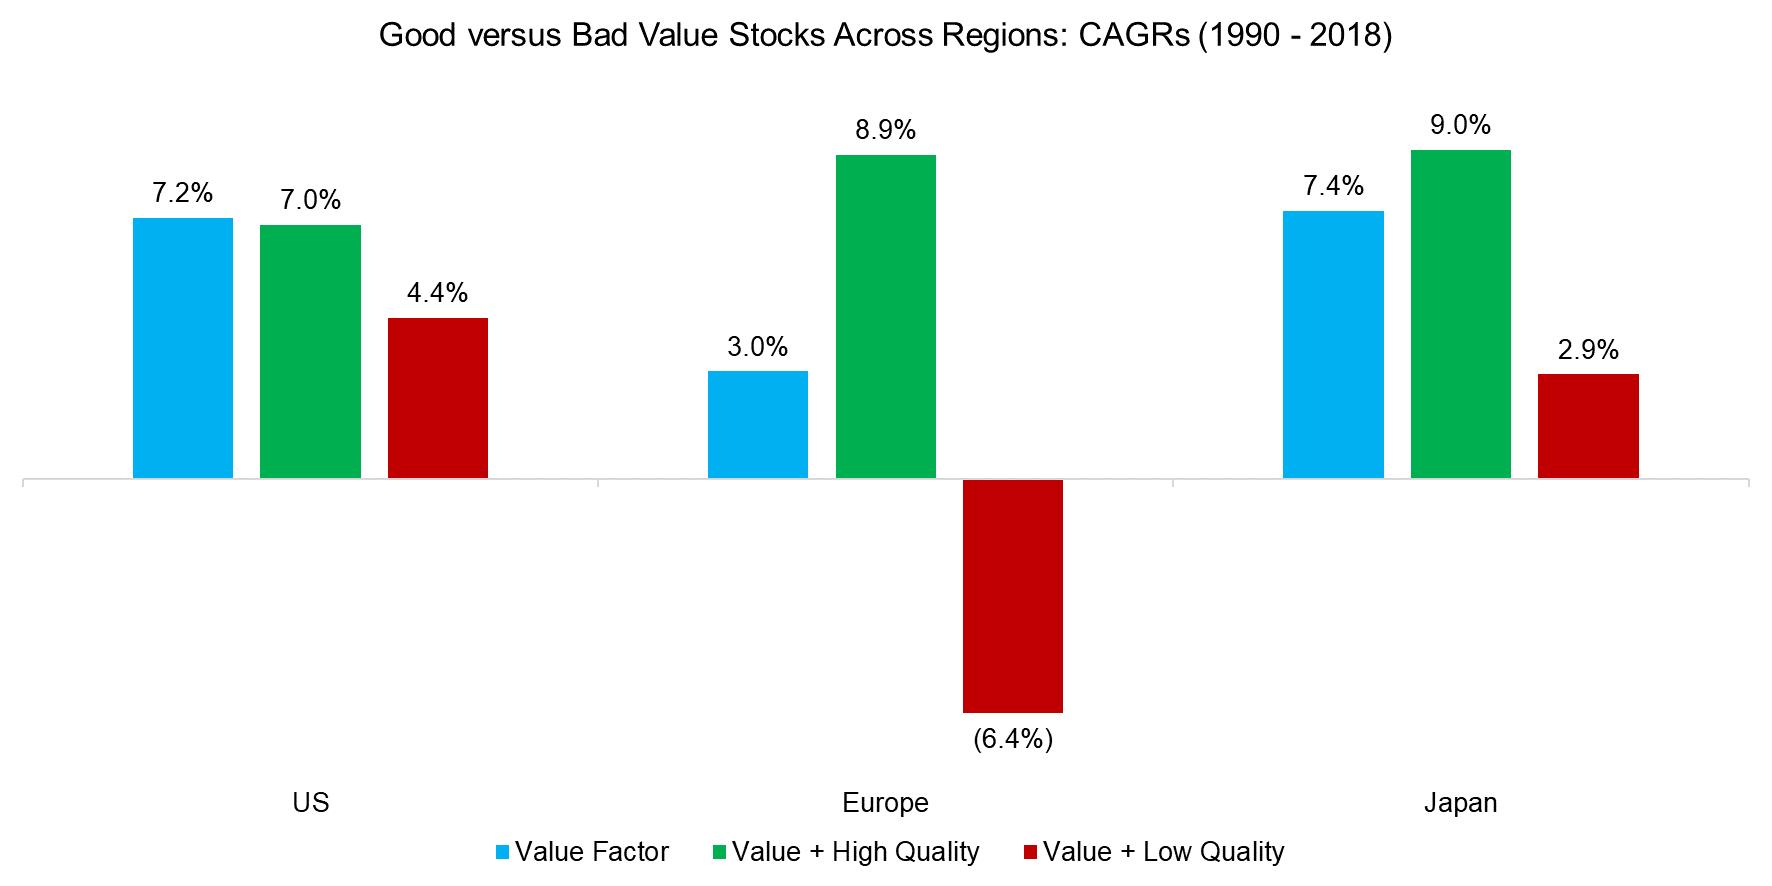 Good versus Bad Value Stocks Across Regions CAGRs (1990 - 2018)